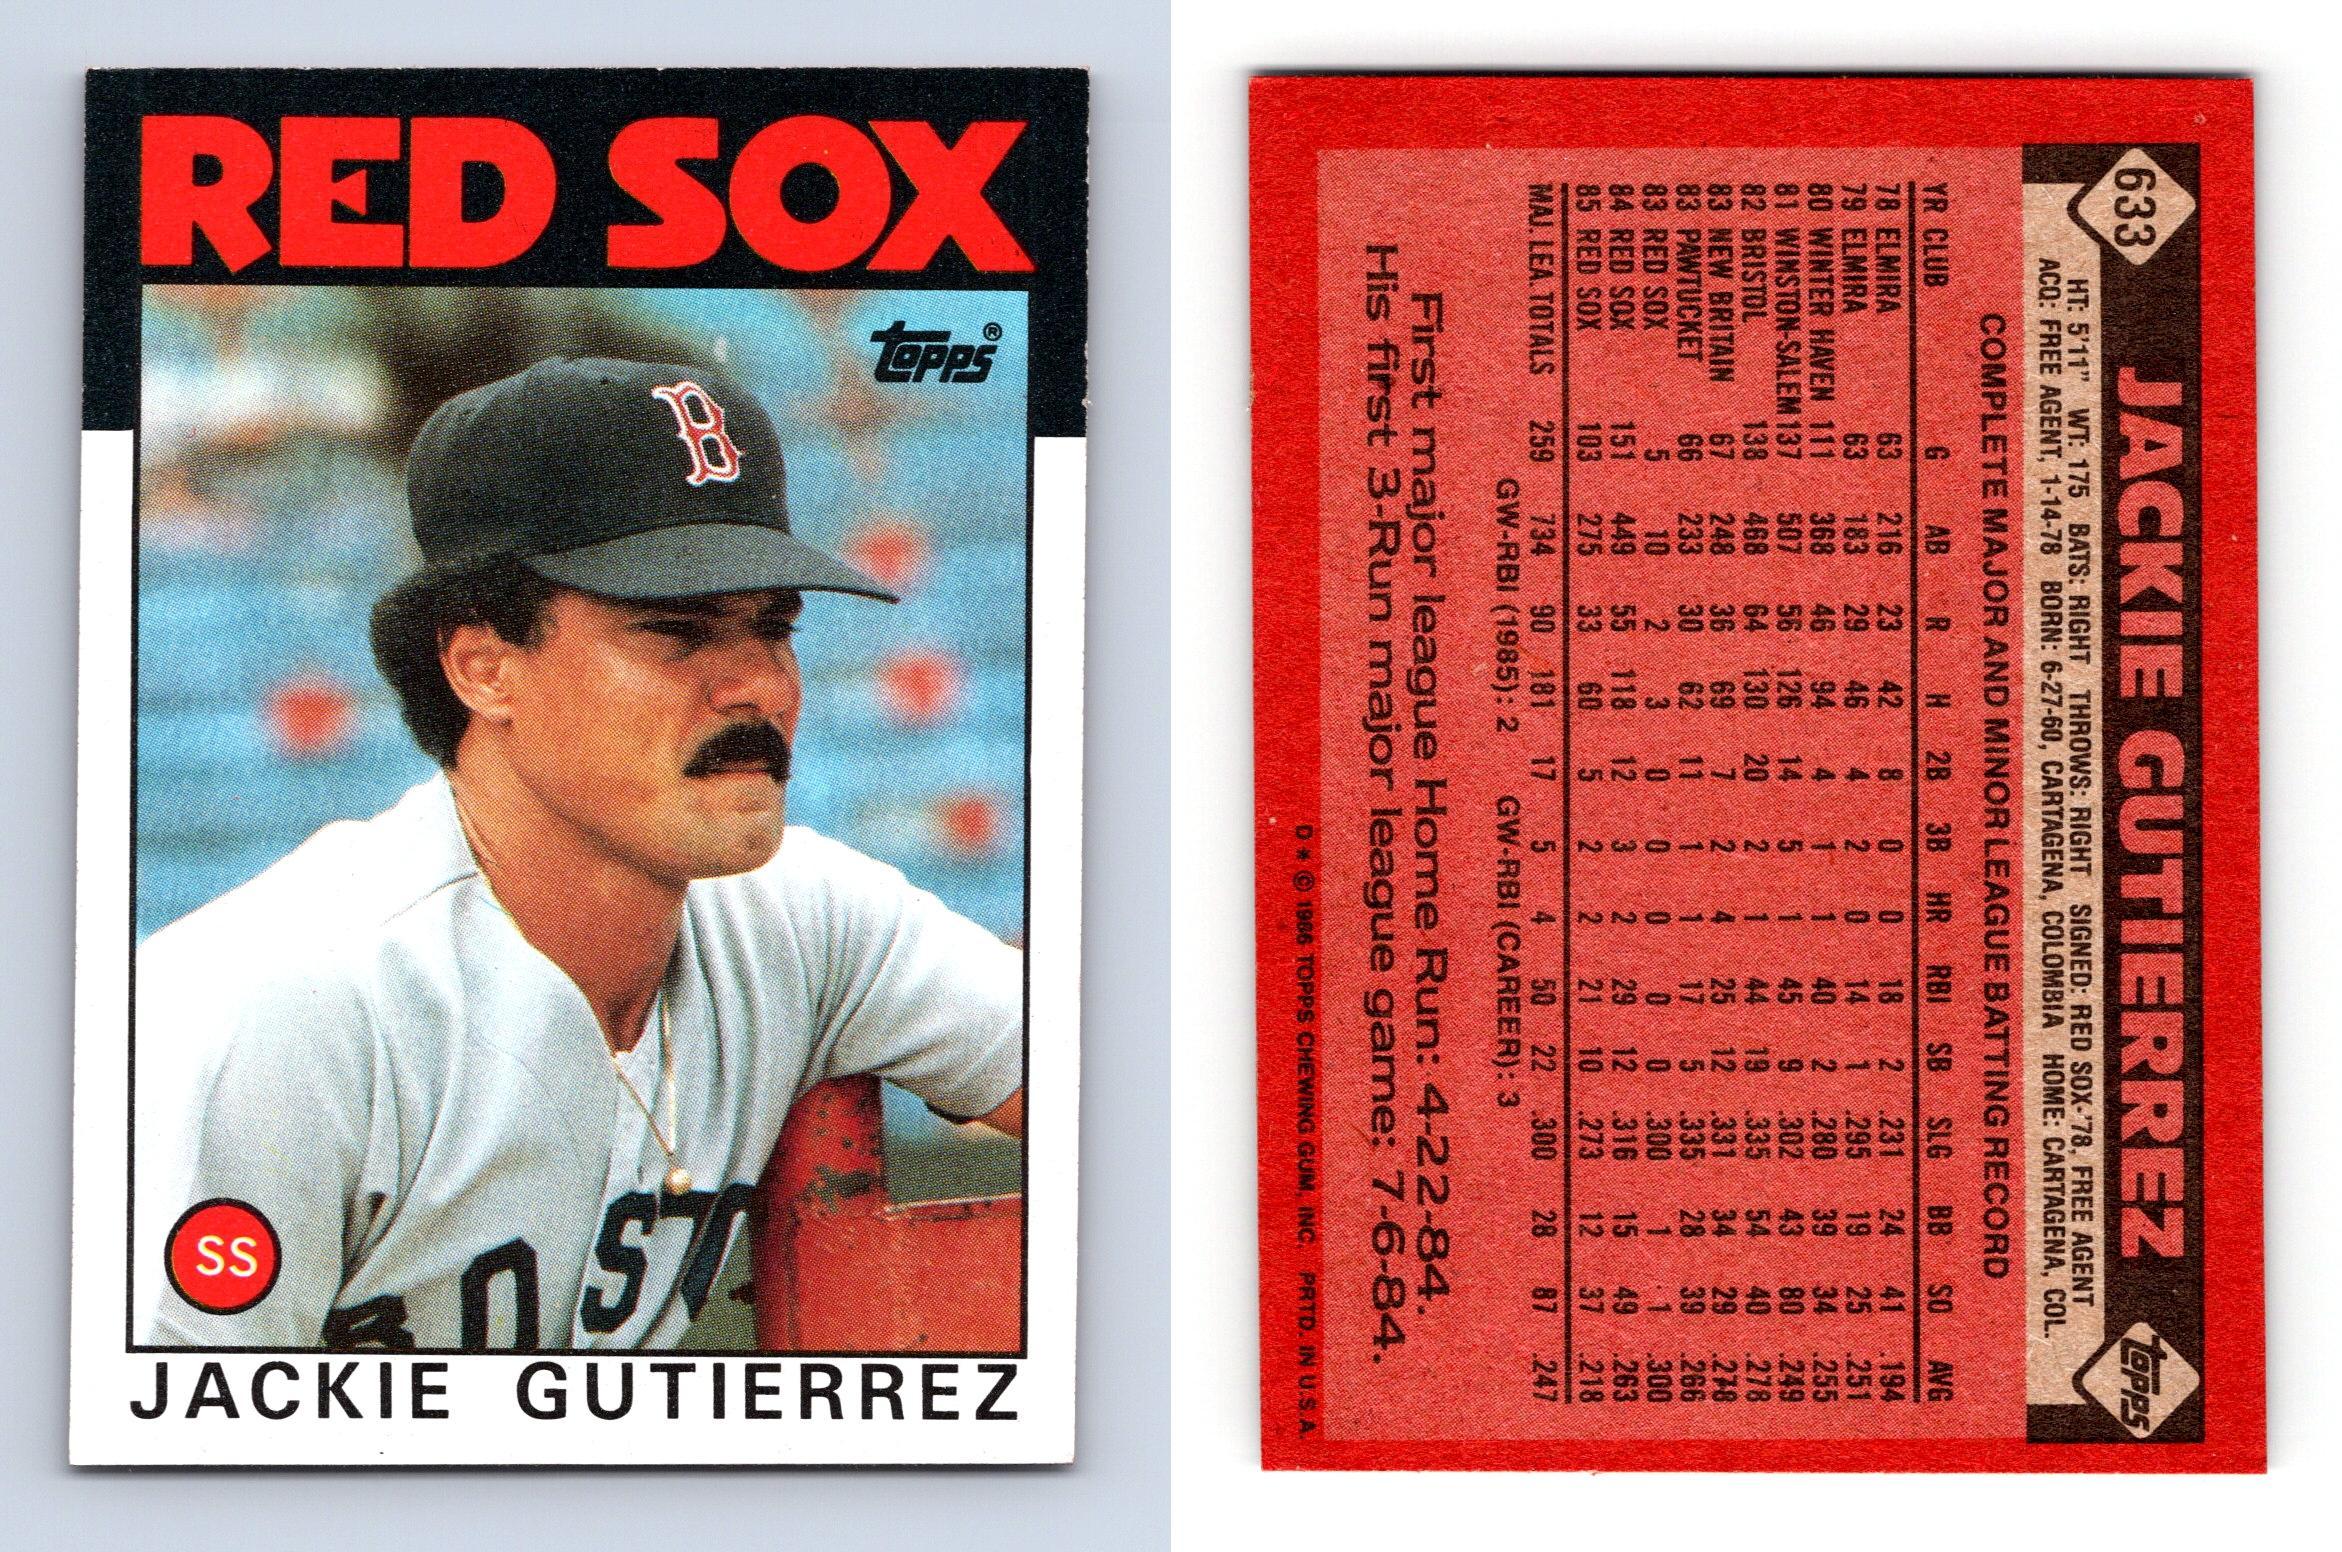 1986 Topps Baseball Card #633 Jackie Gutierrez